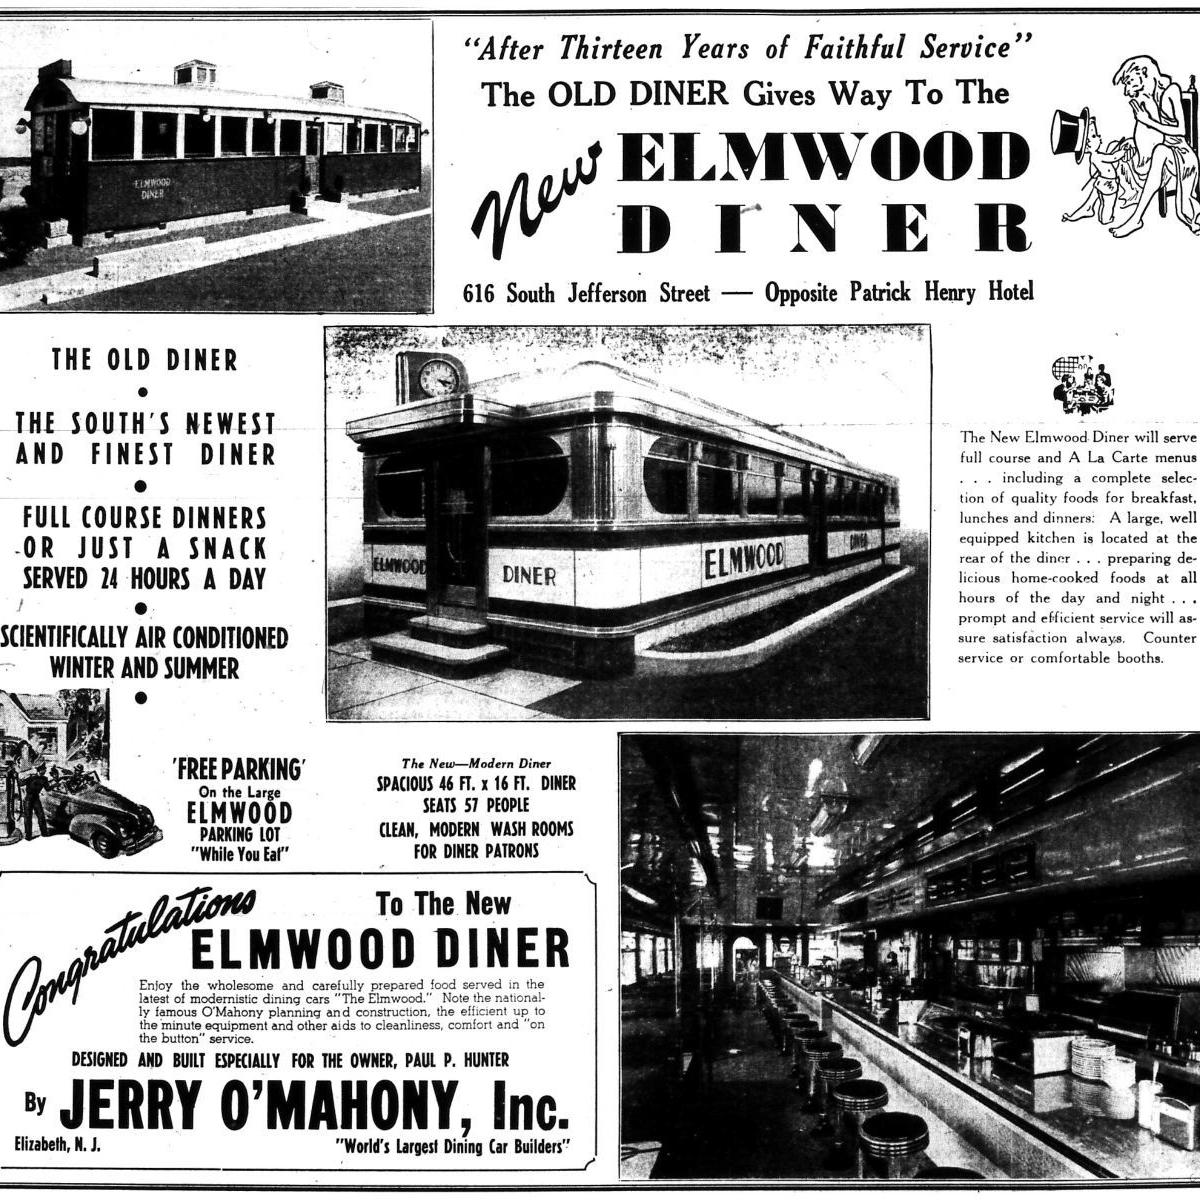 Looking Back: New Elmwood Diner, Jeopardy celebrity | News | roanoke com